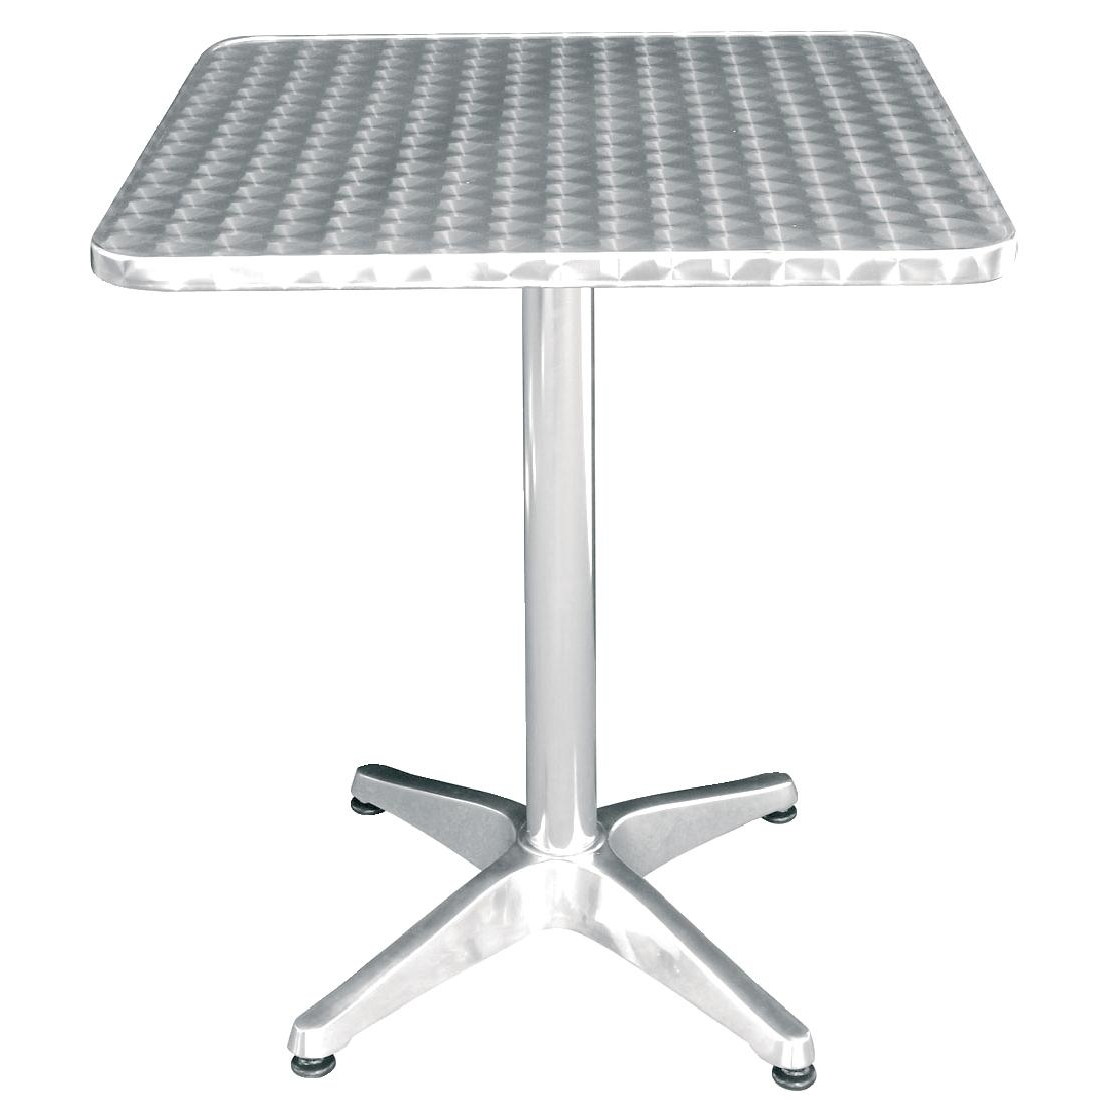 Table bistro carrée 600mm